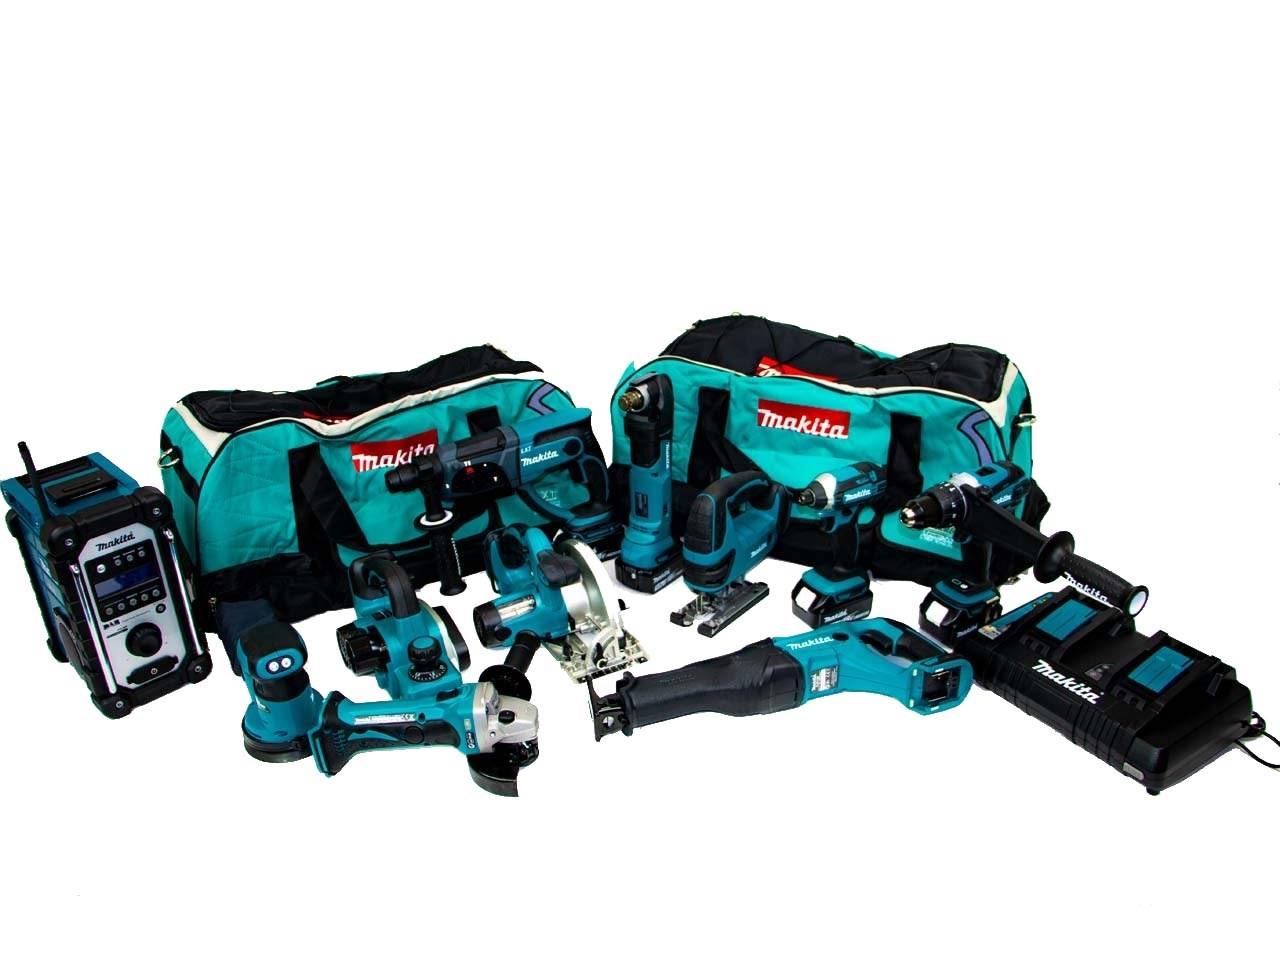 Makita Mak11pc 18v 4x50ah Lxt Li Ion 11pc Power Tool Kit